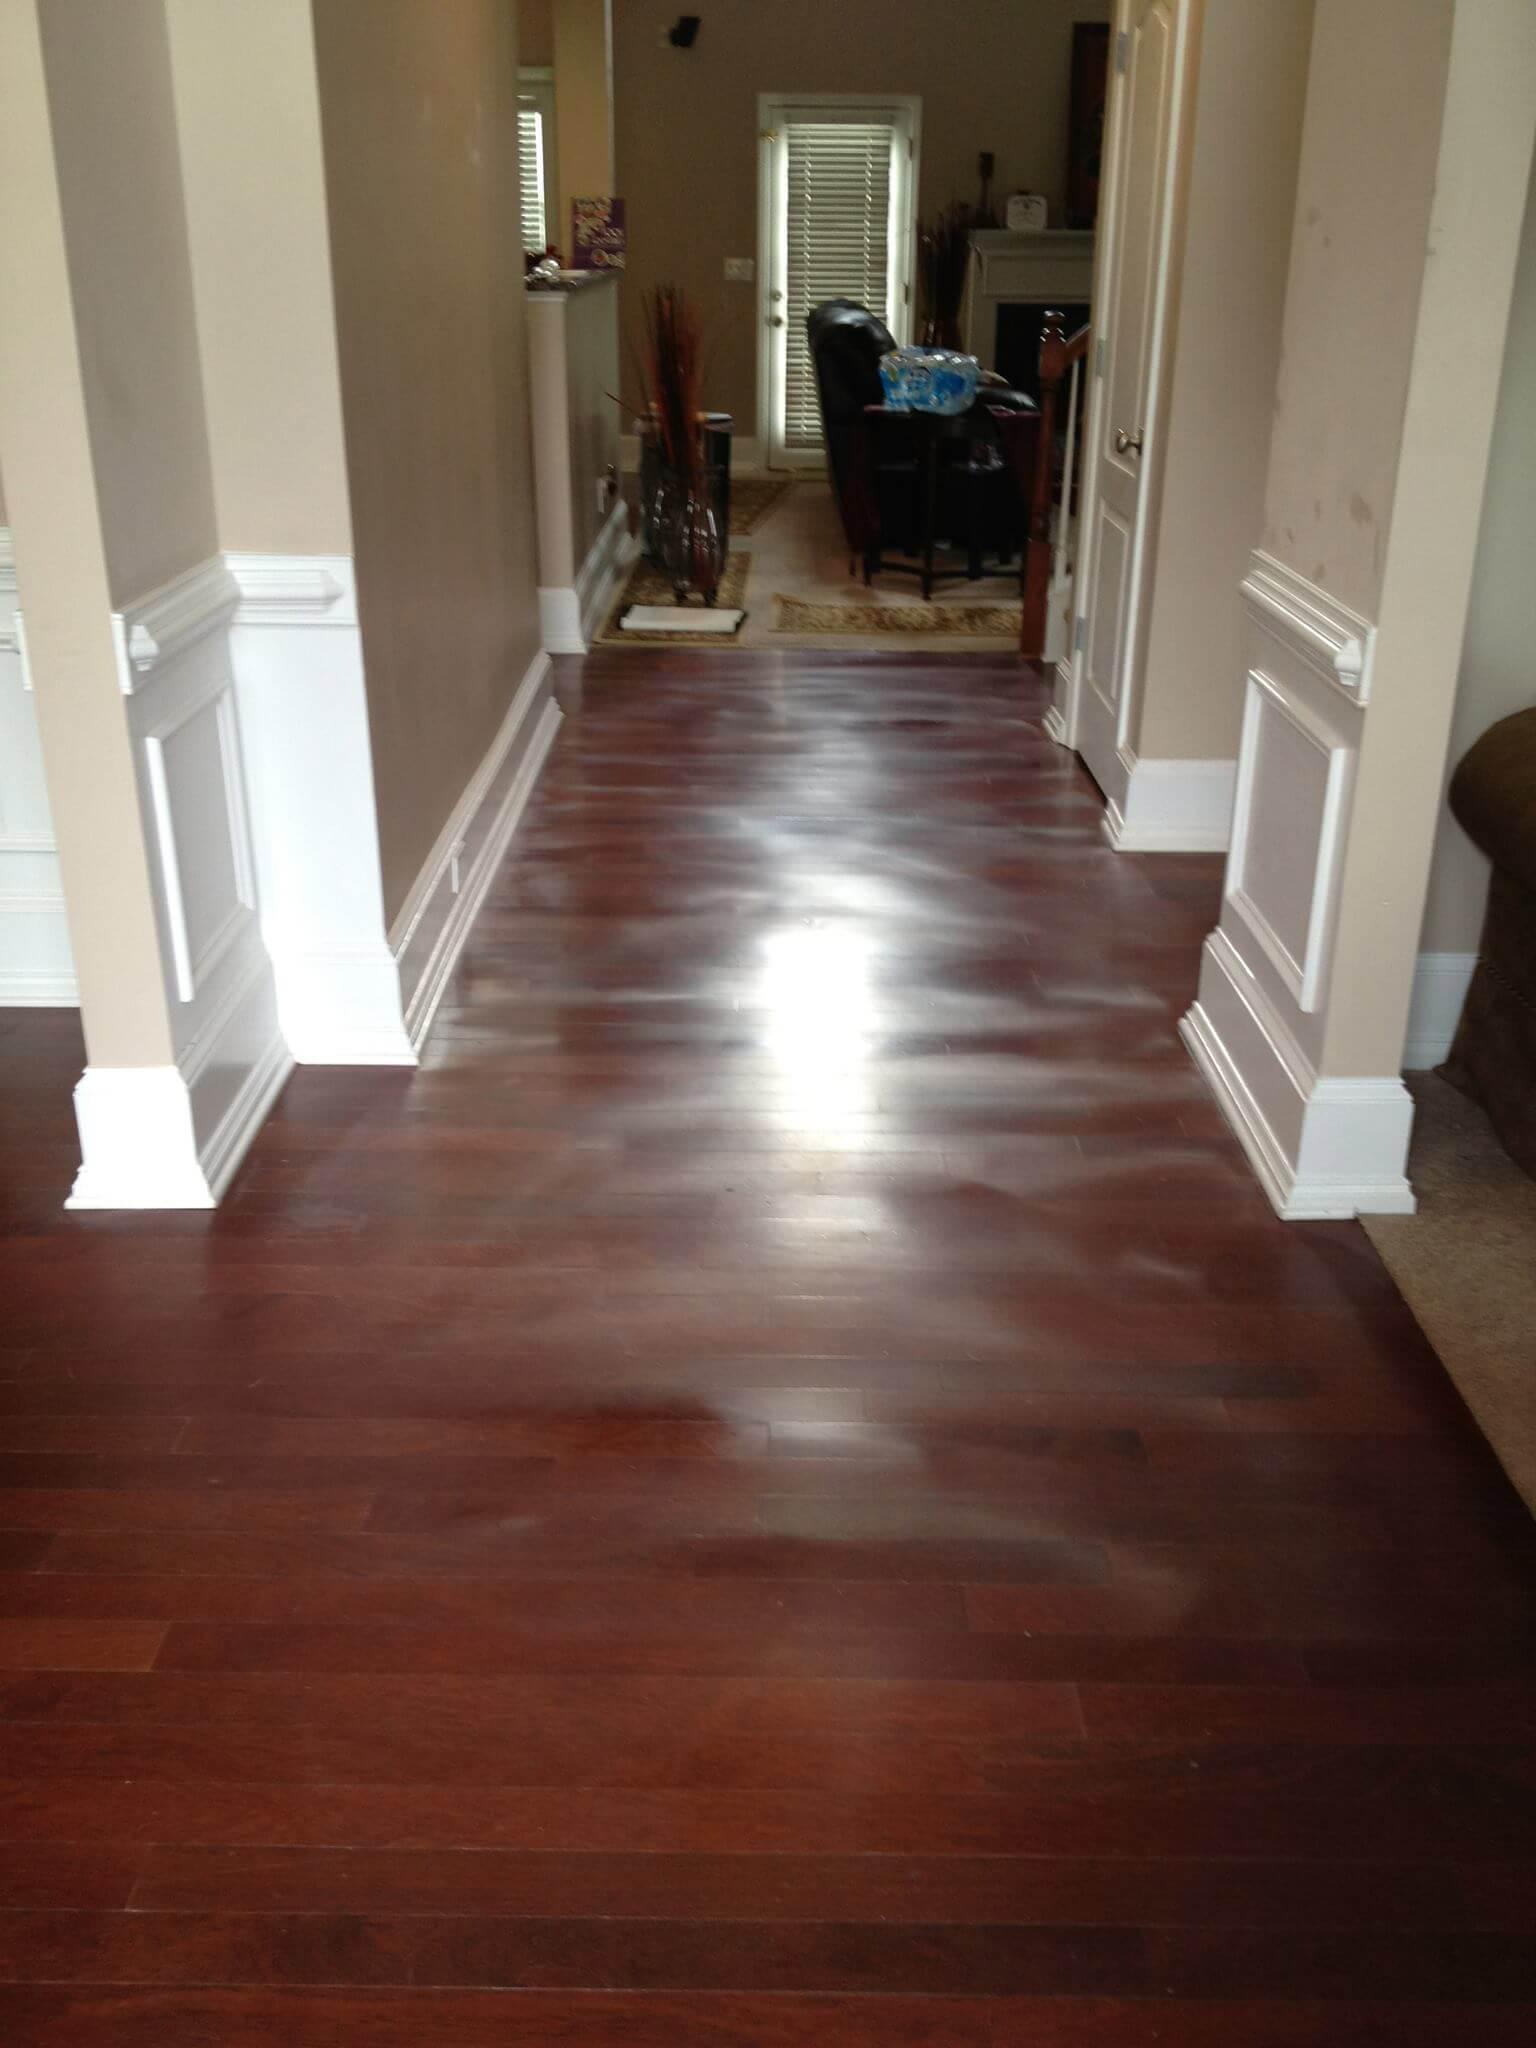 warping and red hardwood floor in need of fixing.